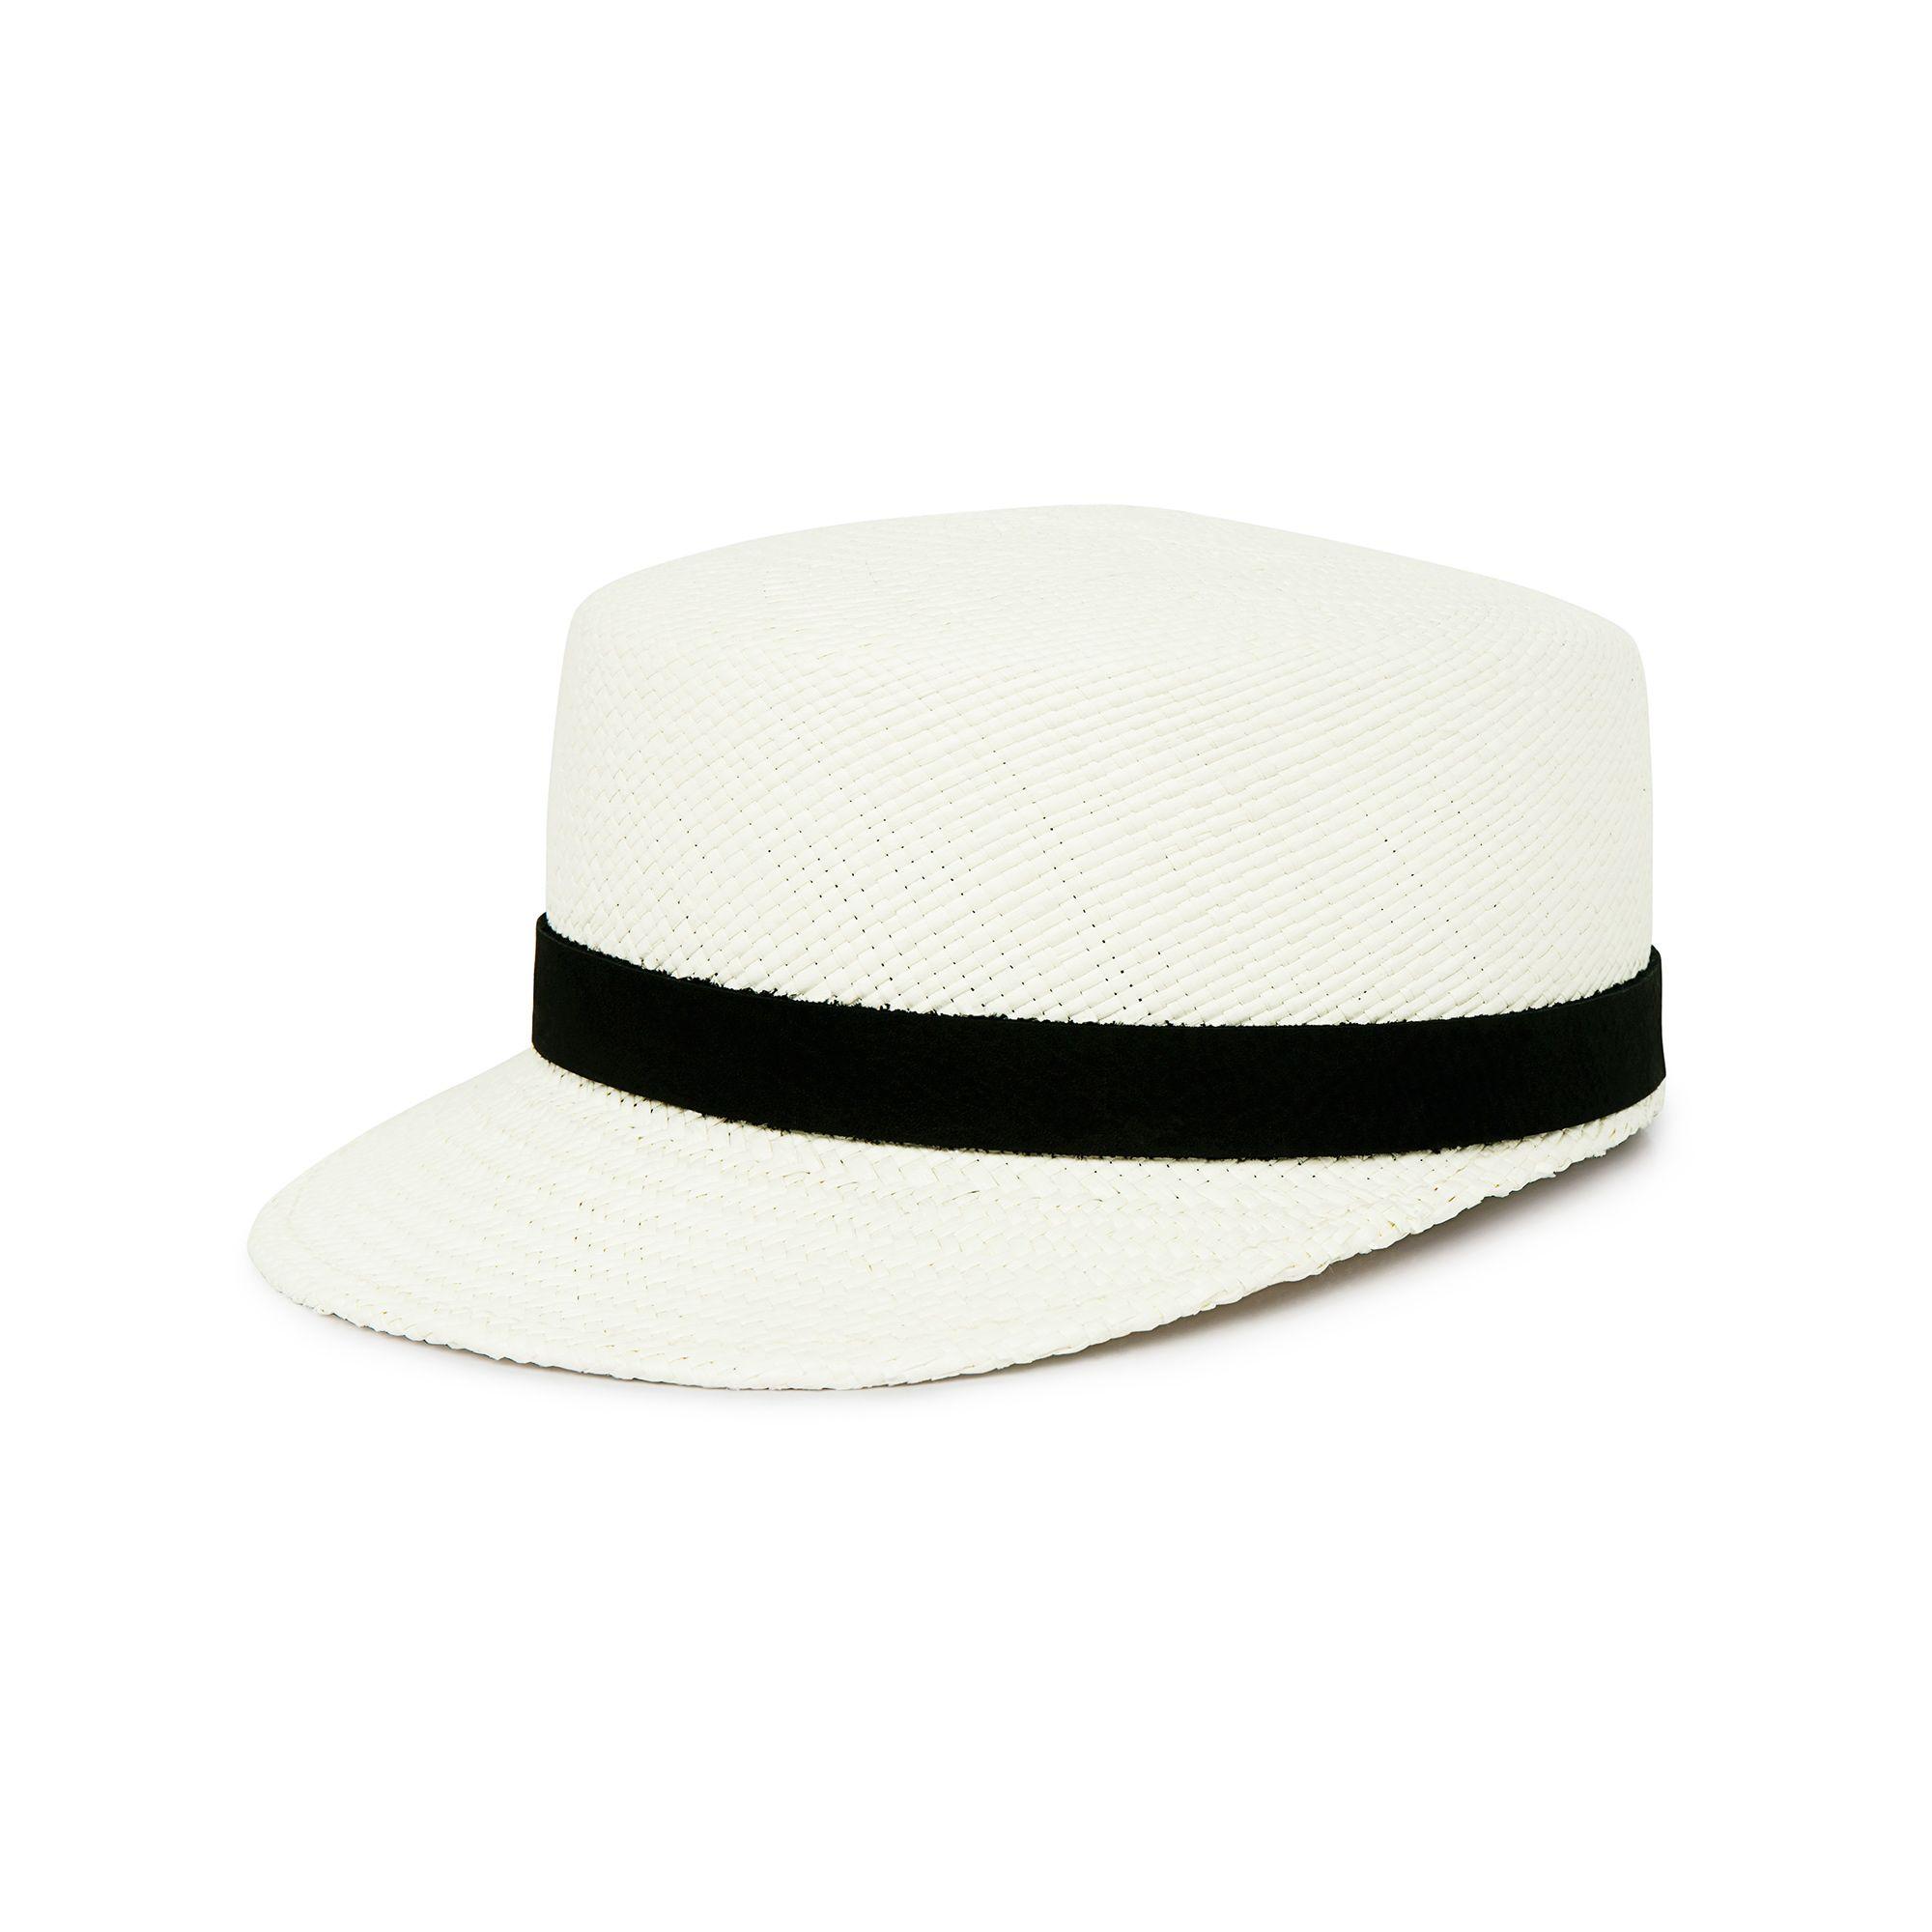 Discover ideas about Vintage Leather Backpack. JANESSA LEONE zinnia bolero  hat ... 4480972d9c3e